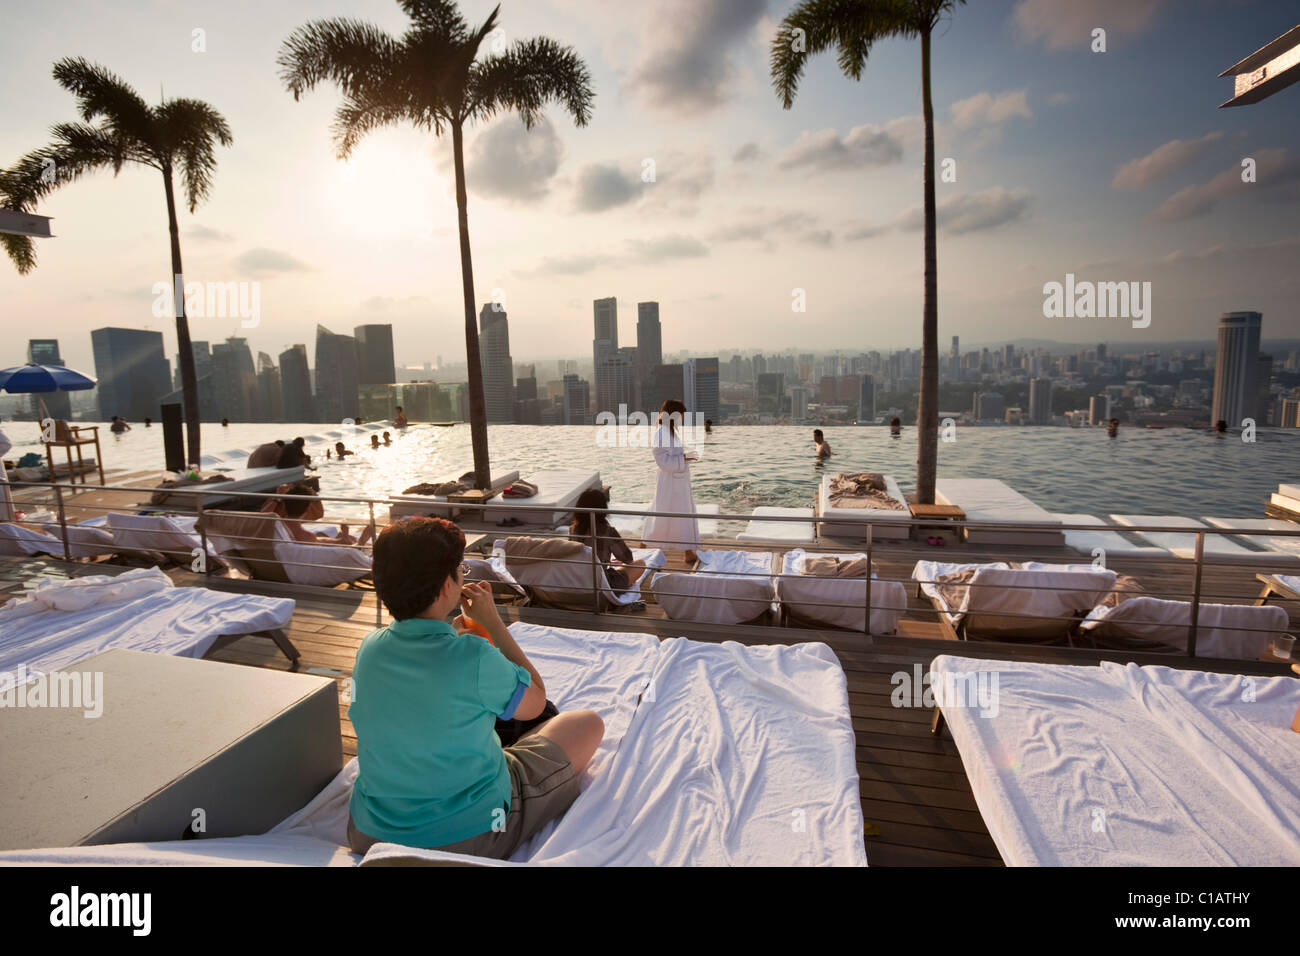 Woman drinking cocktails at the Marina Bay Sands SkyPark pool.  Marina Bay, Singapore - Stock Image